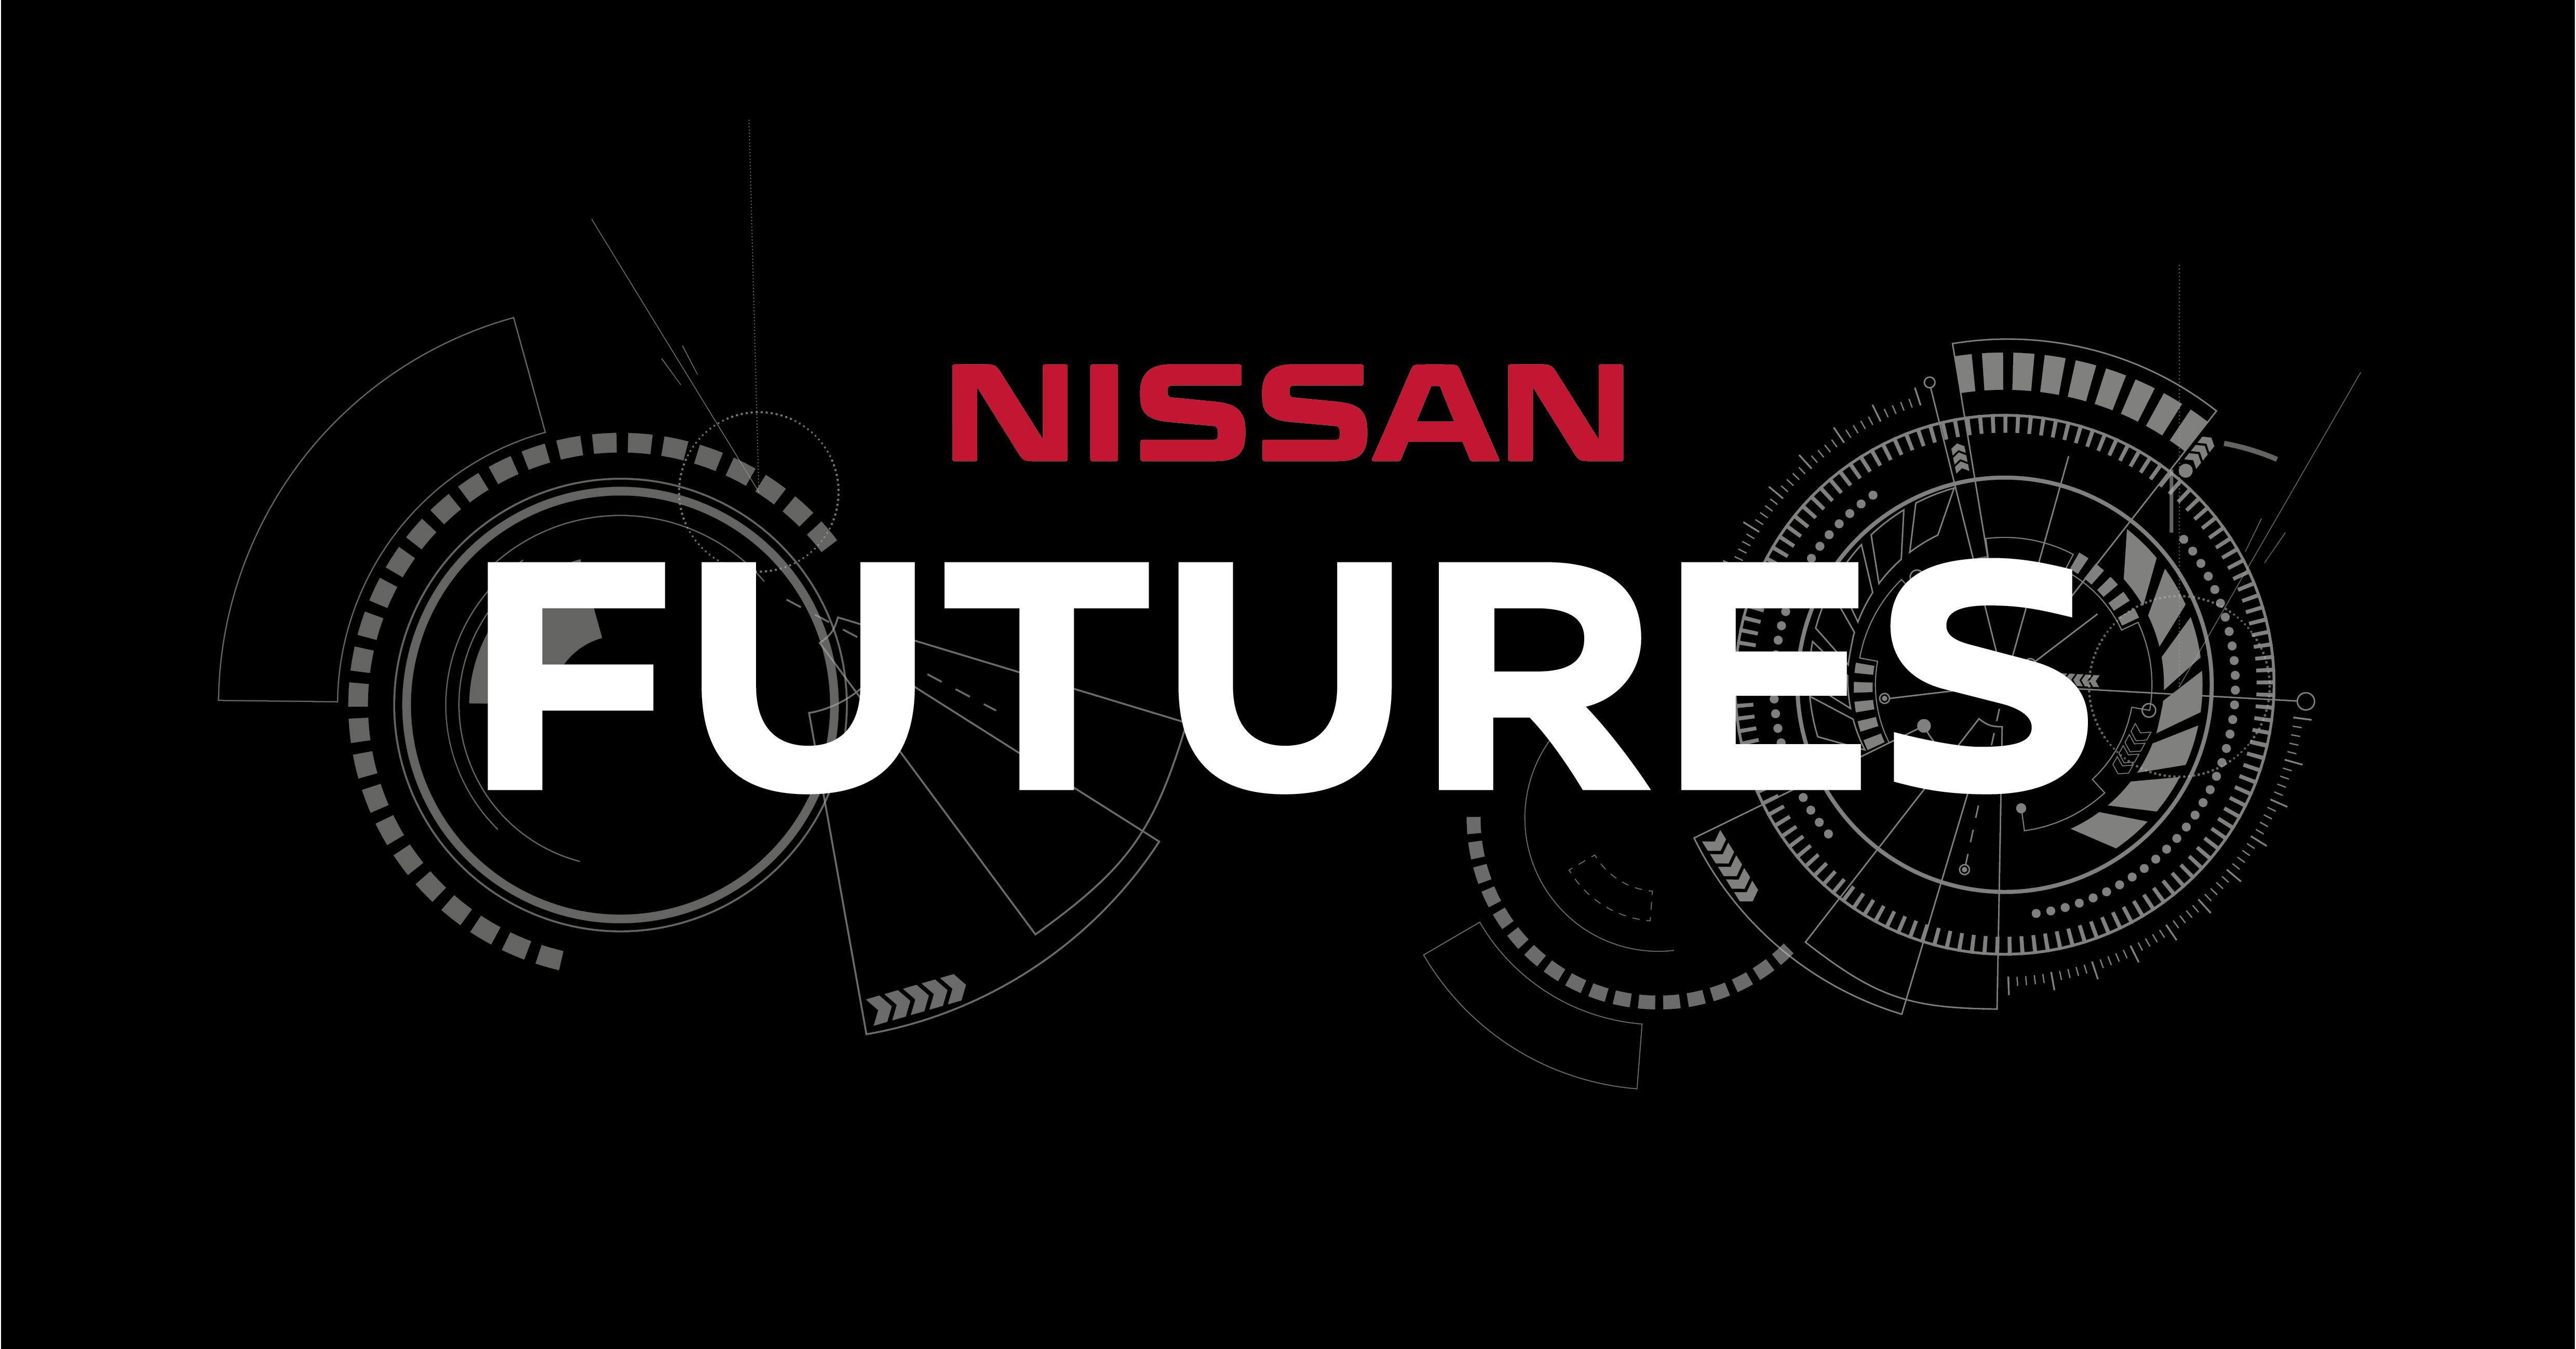 cars, nissan, nissan leaf, nissan futures